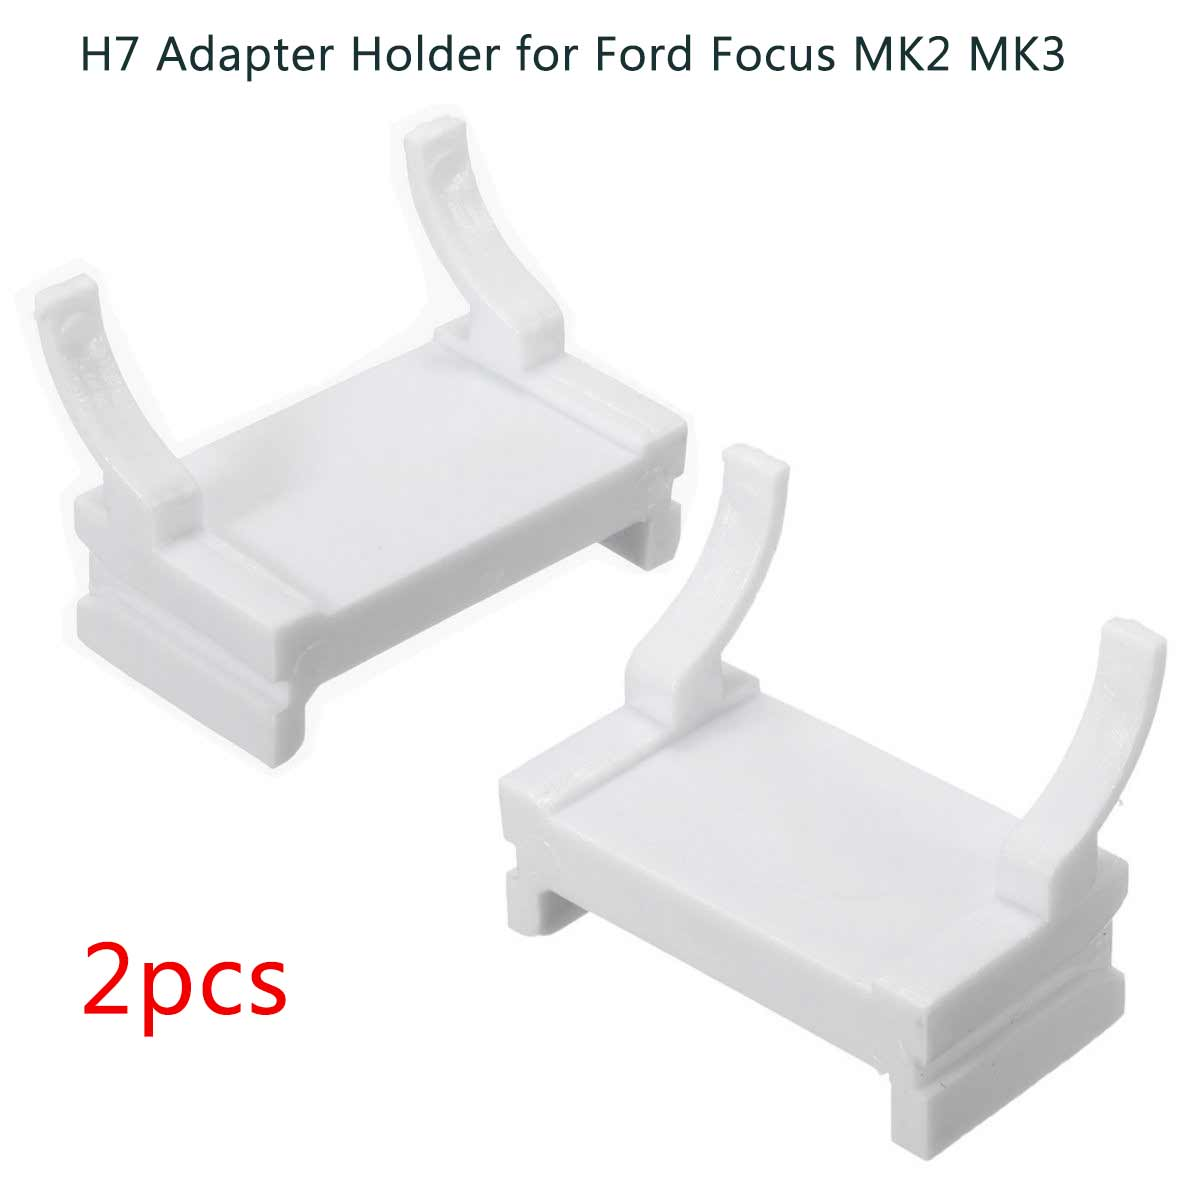 2PCS Car HID H7 Bulbs Adapter Xenon Lamp Holder White Base For Ford Focus MK2 MK3